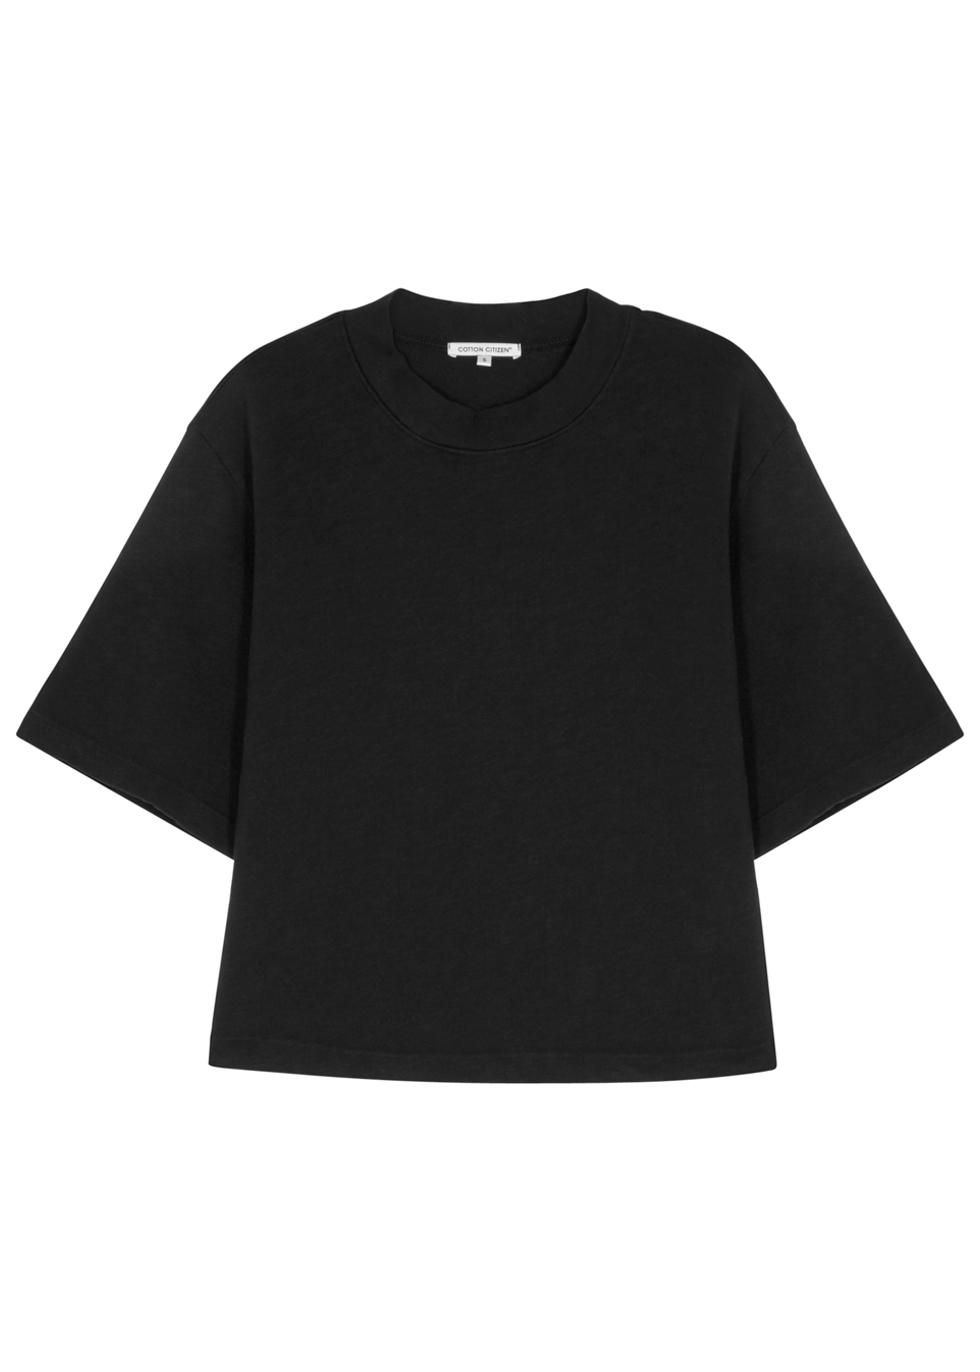 TOKYO BLACK CROPPED COTTON T-SHIRT